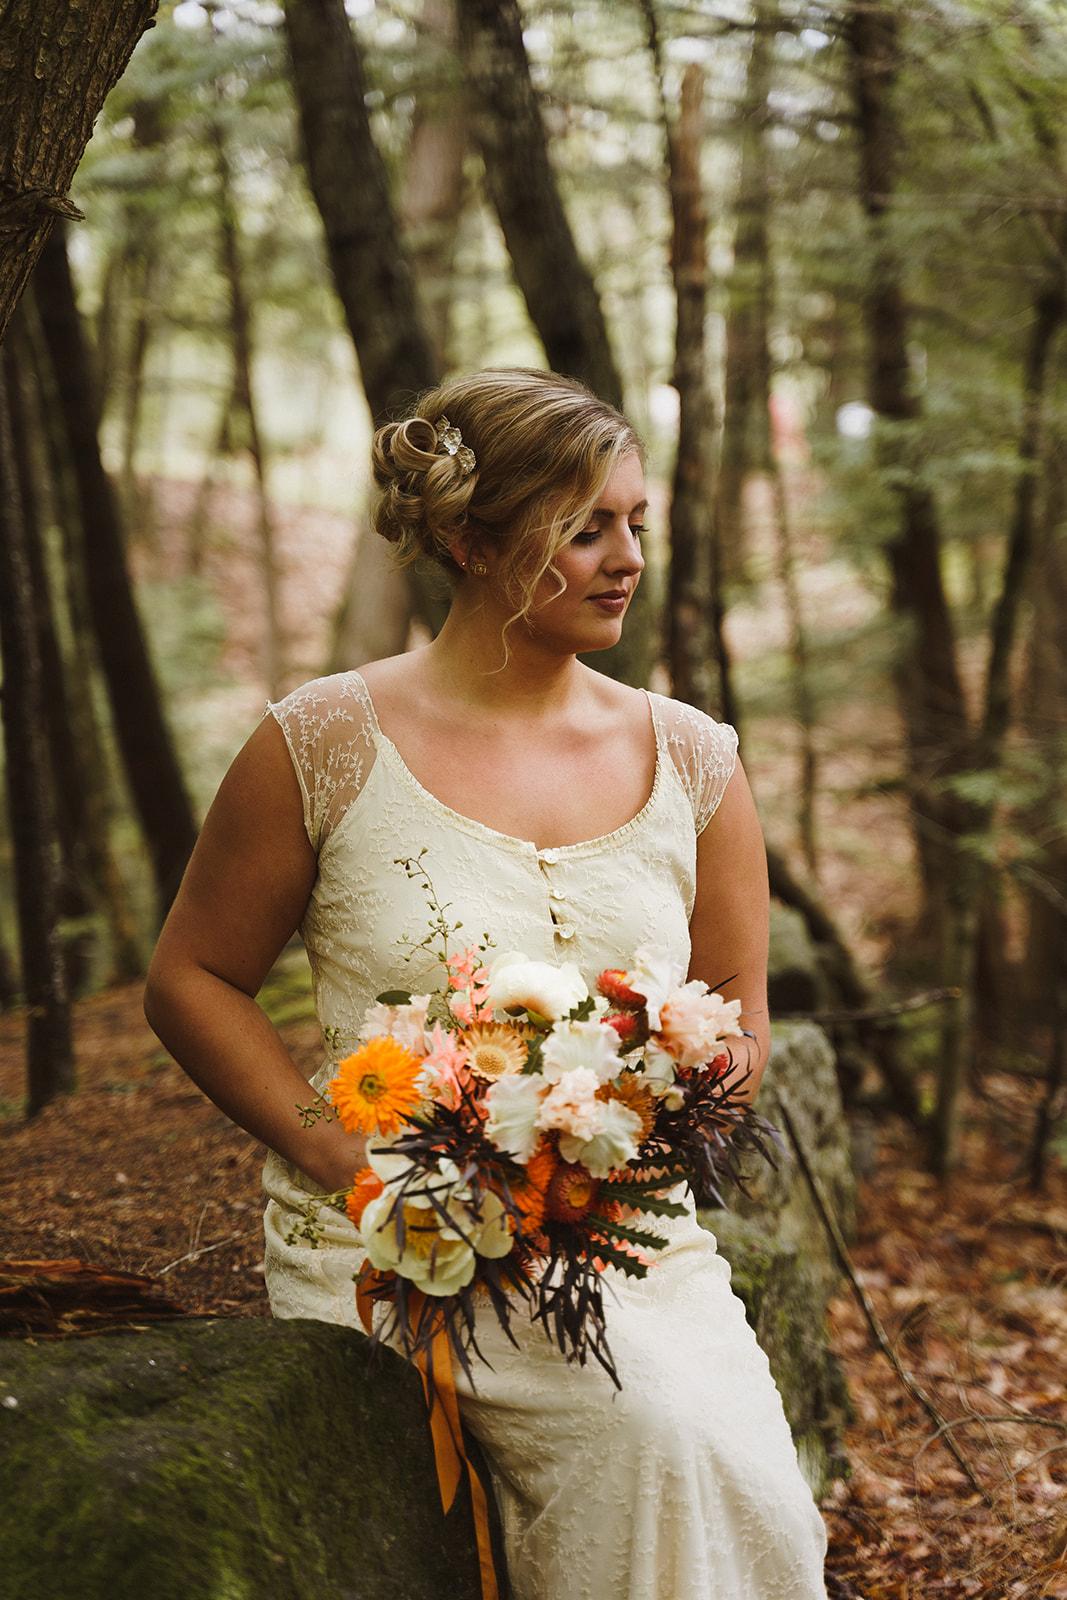 Tuckaway Tree Farm Lebanon Maine Wedding Inspiration 38